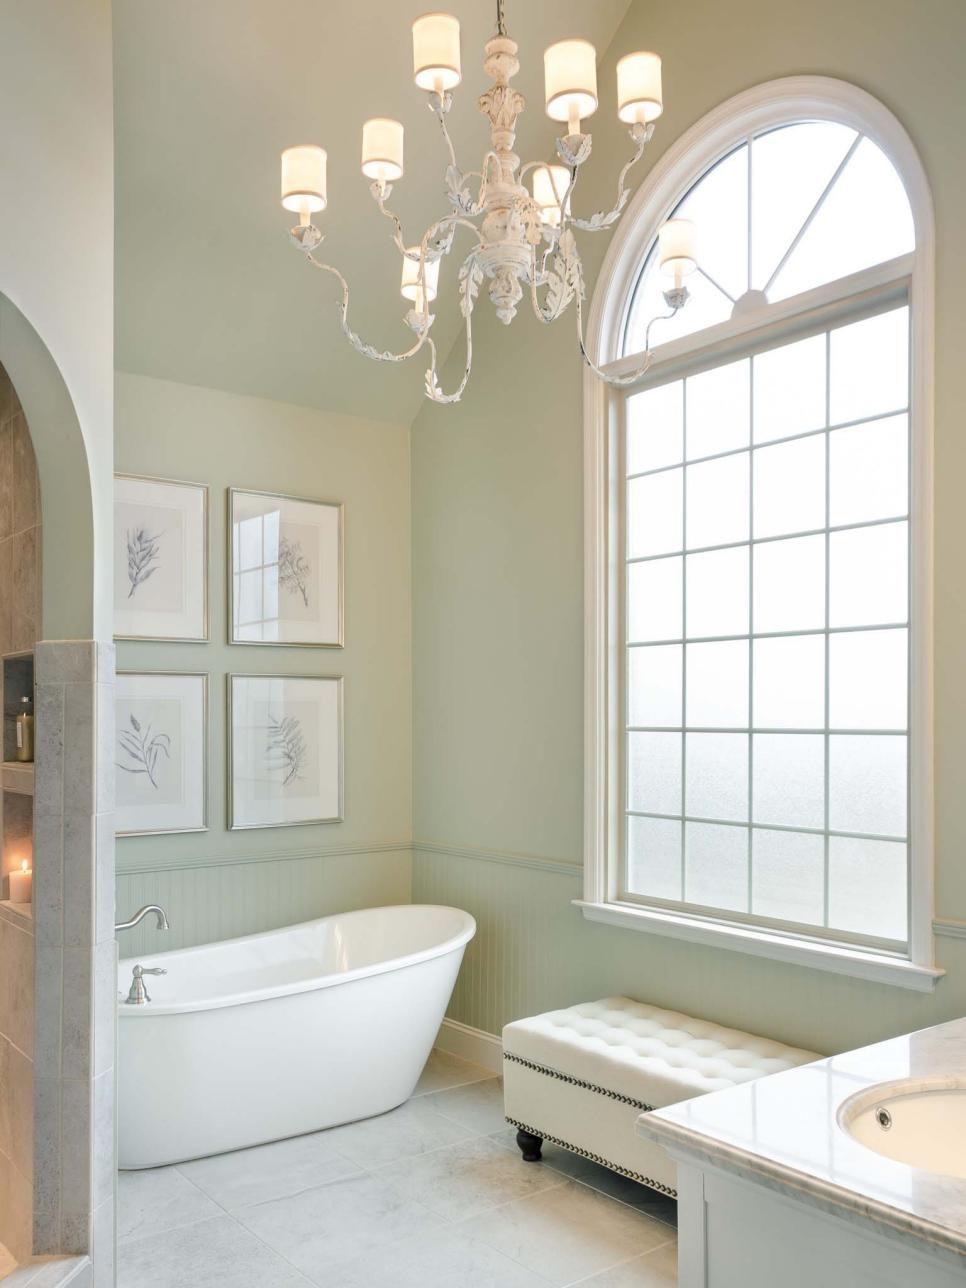 Bathroom Chandeliers Ideas Bathroom Chandeliers Ideas | Bathroom ...